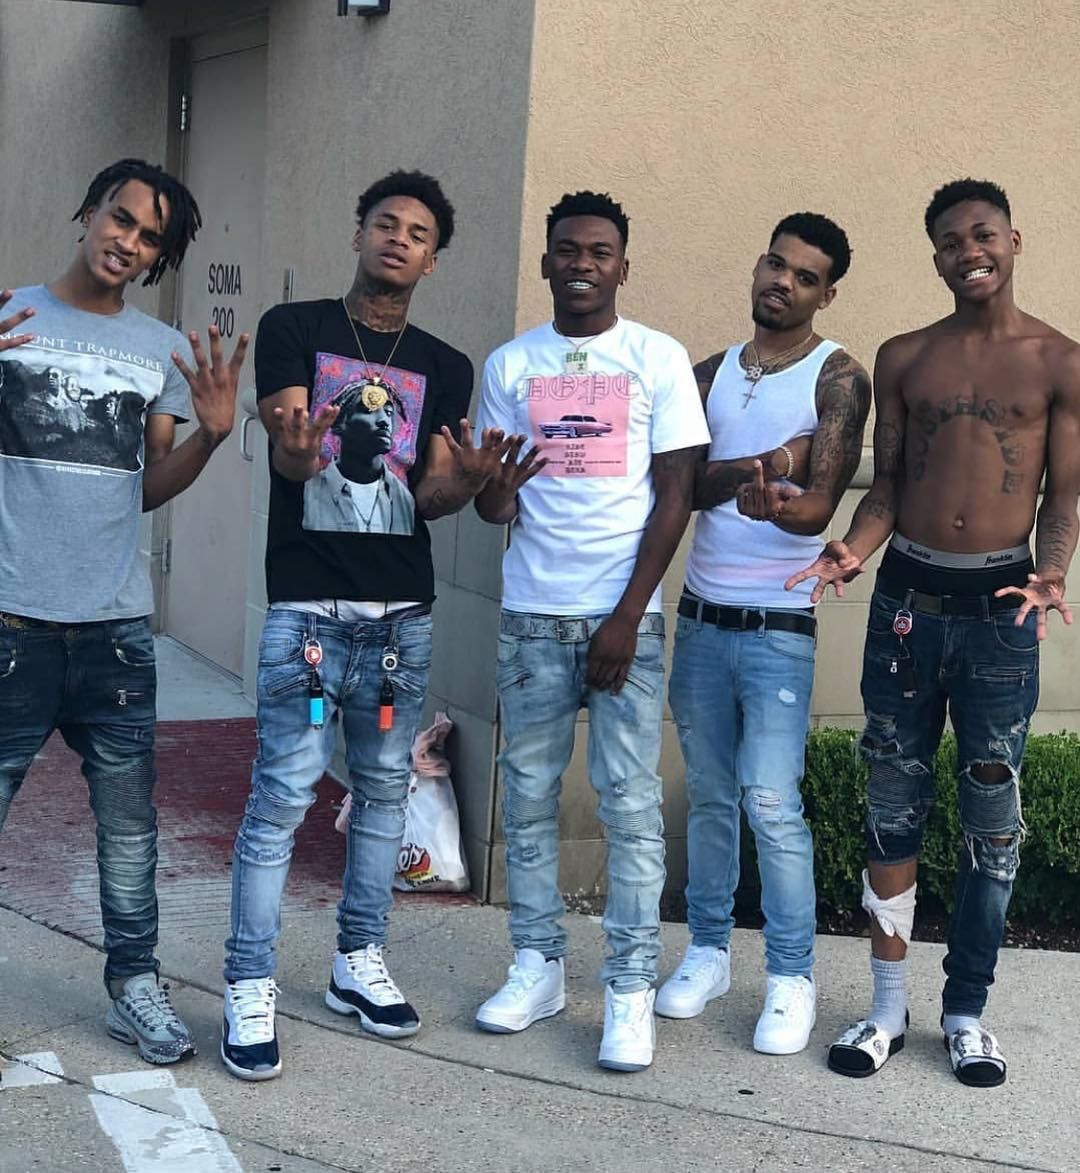 Pin on Trap/hood/fine boys